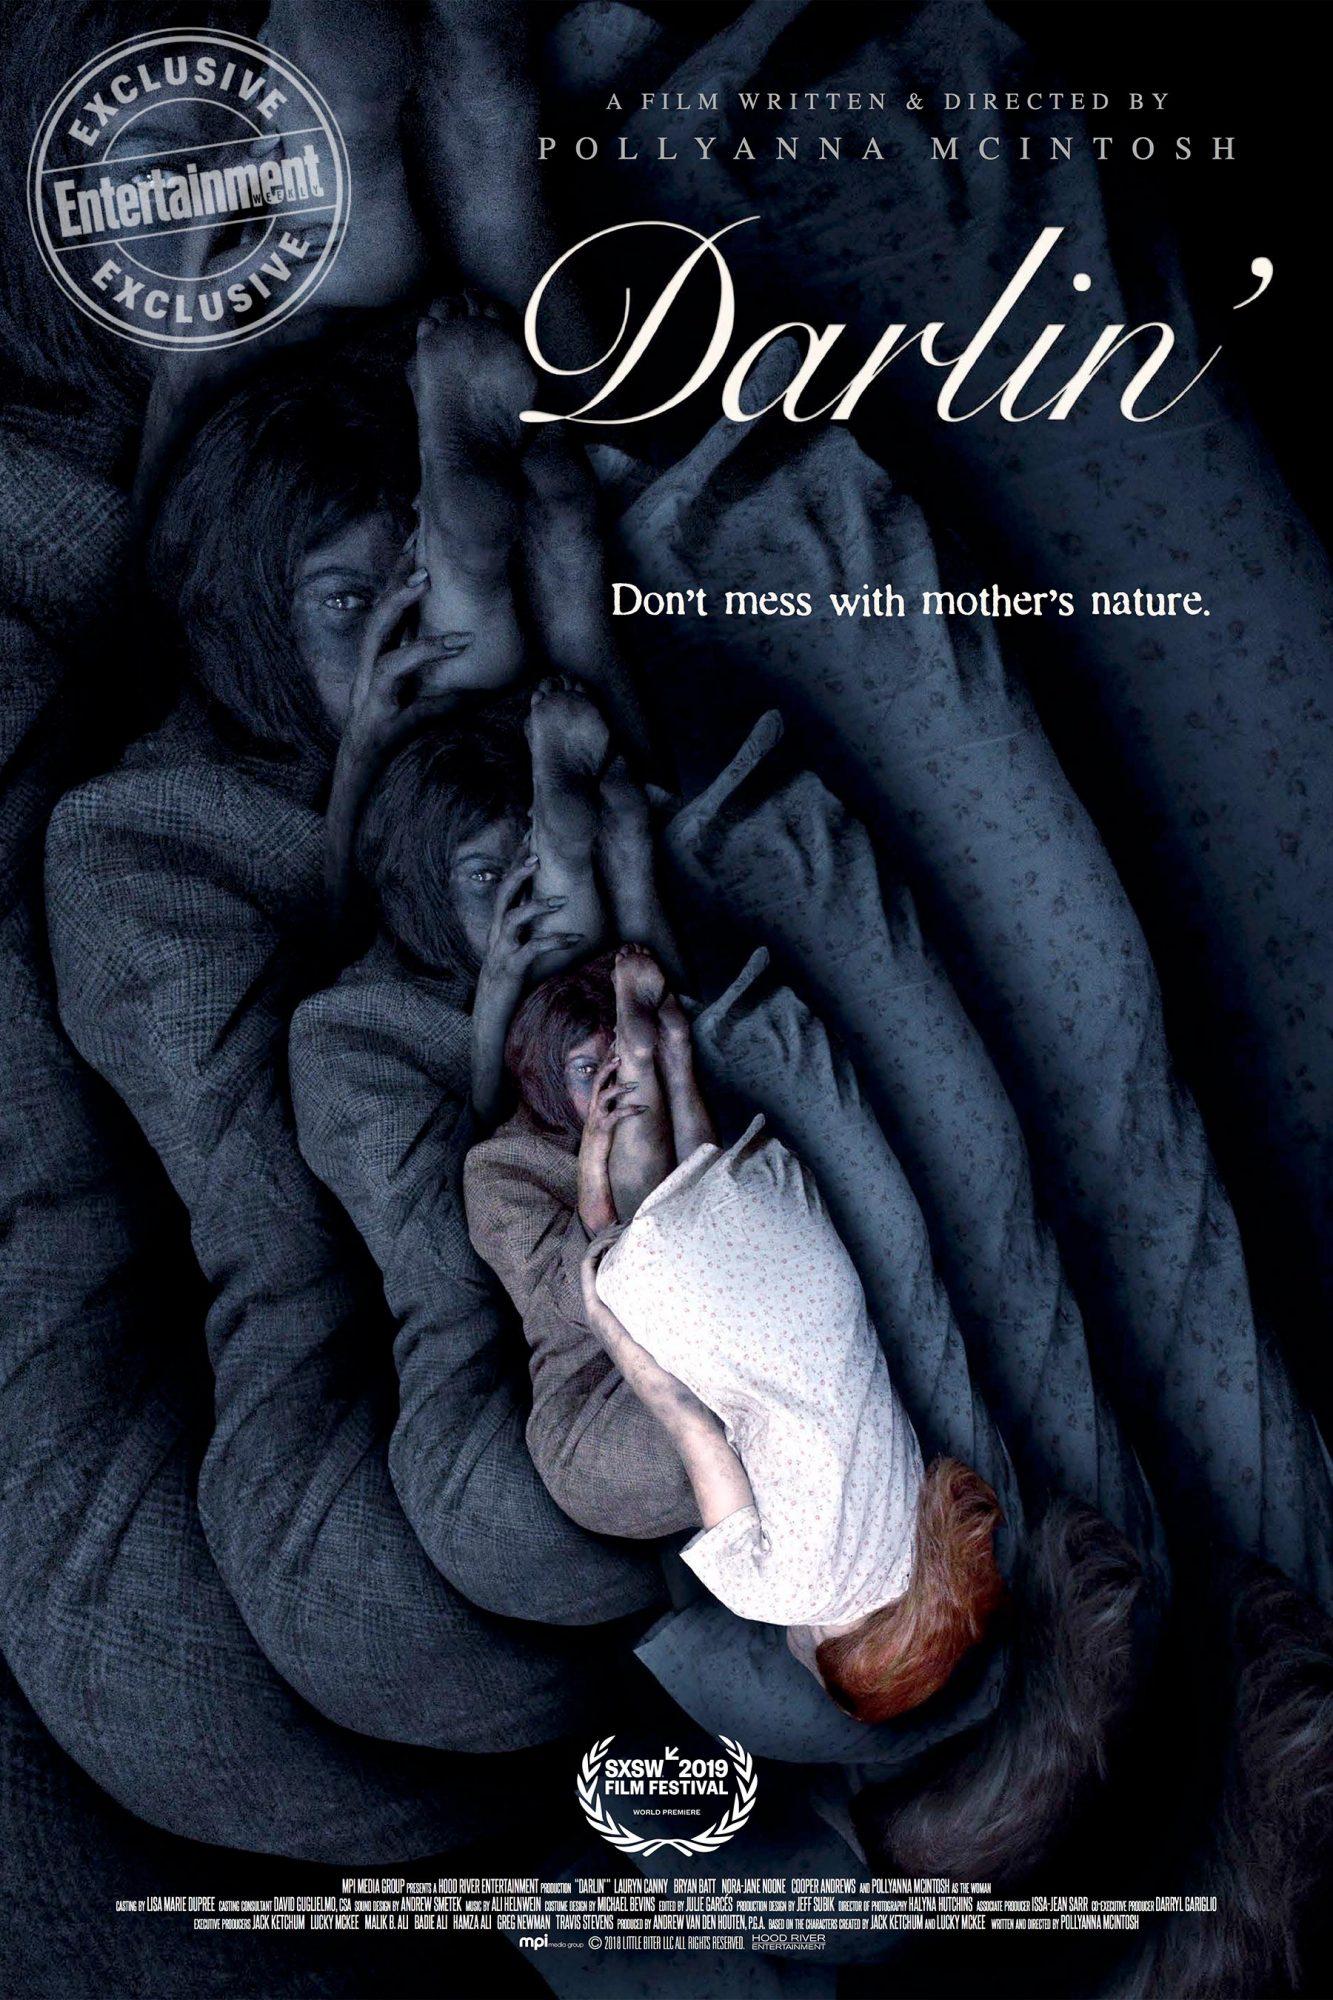 Darlin' (2019) movie posterCR: Hood River Entertainment